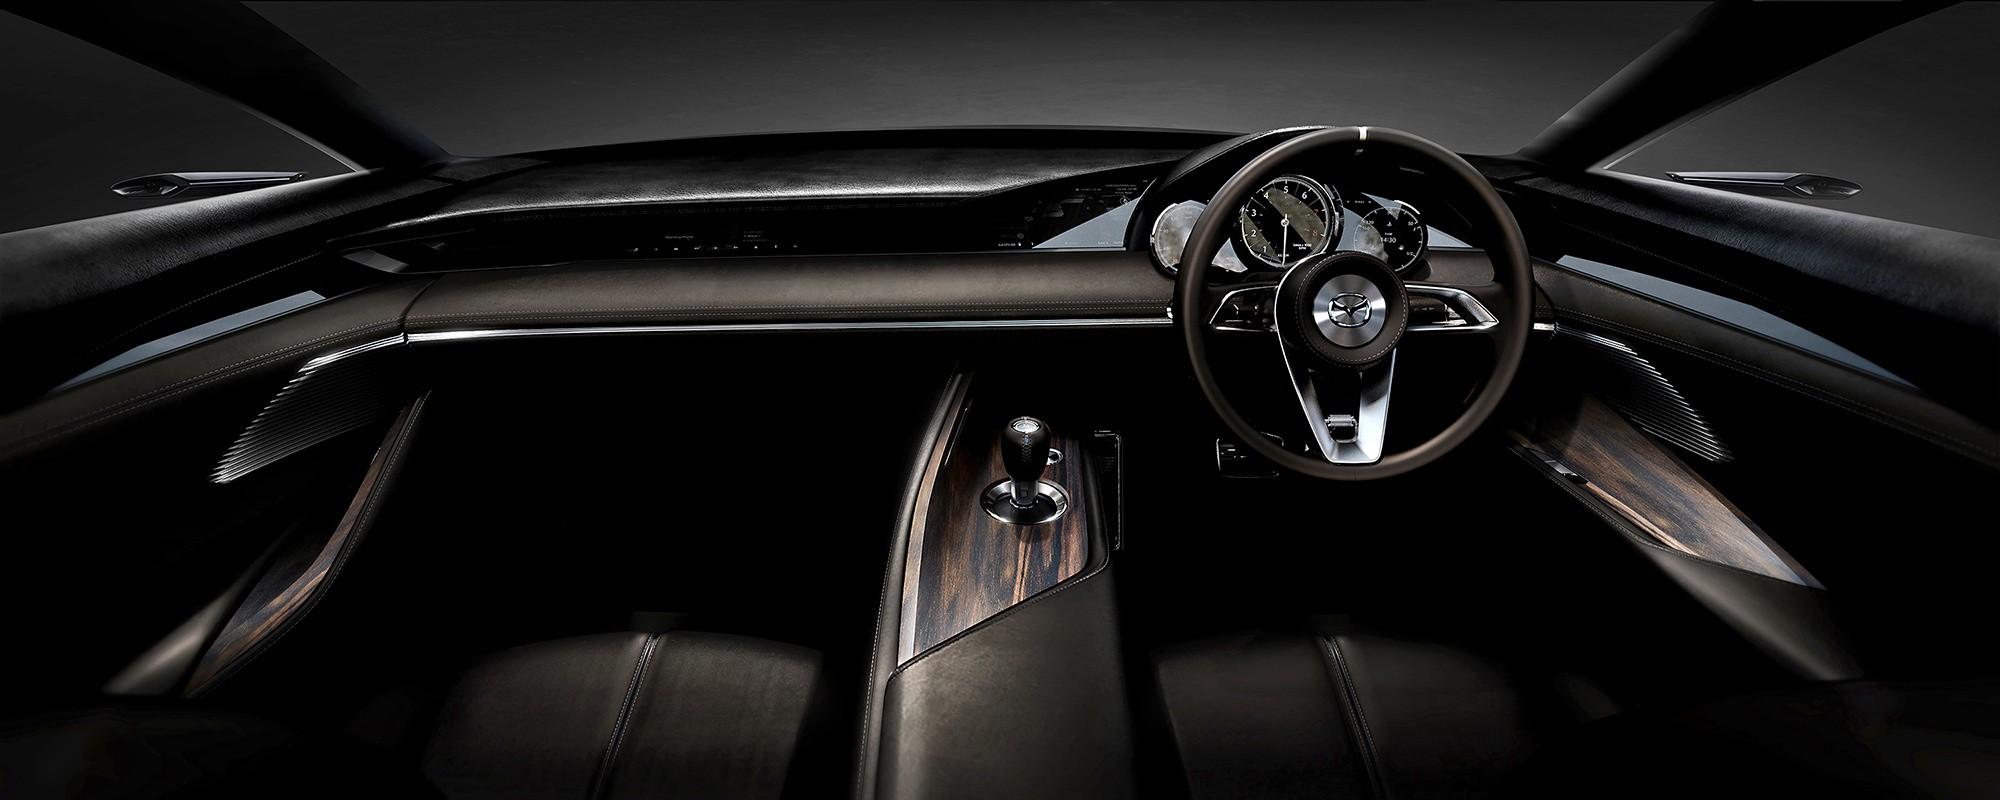 Mazda Vision Coupe салон